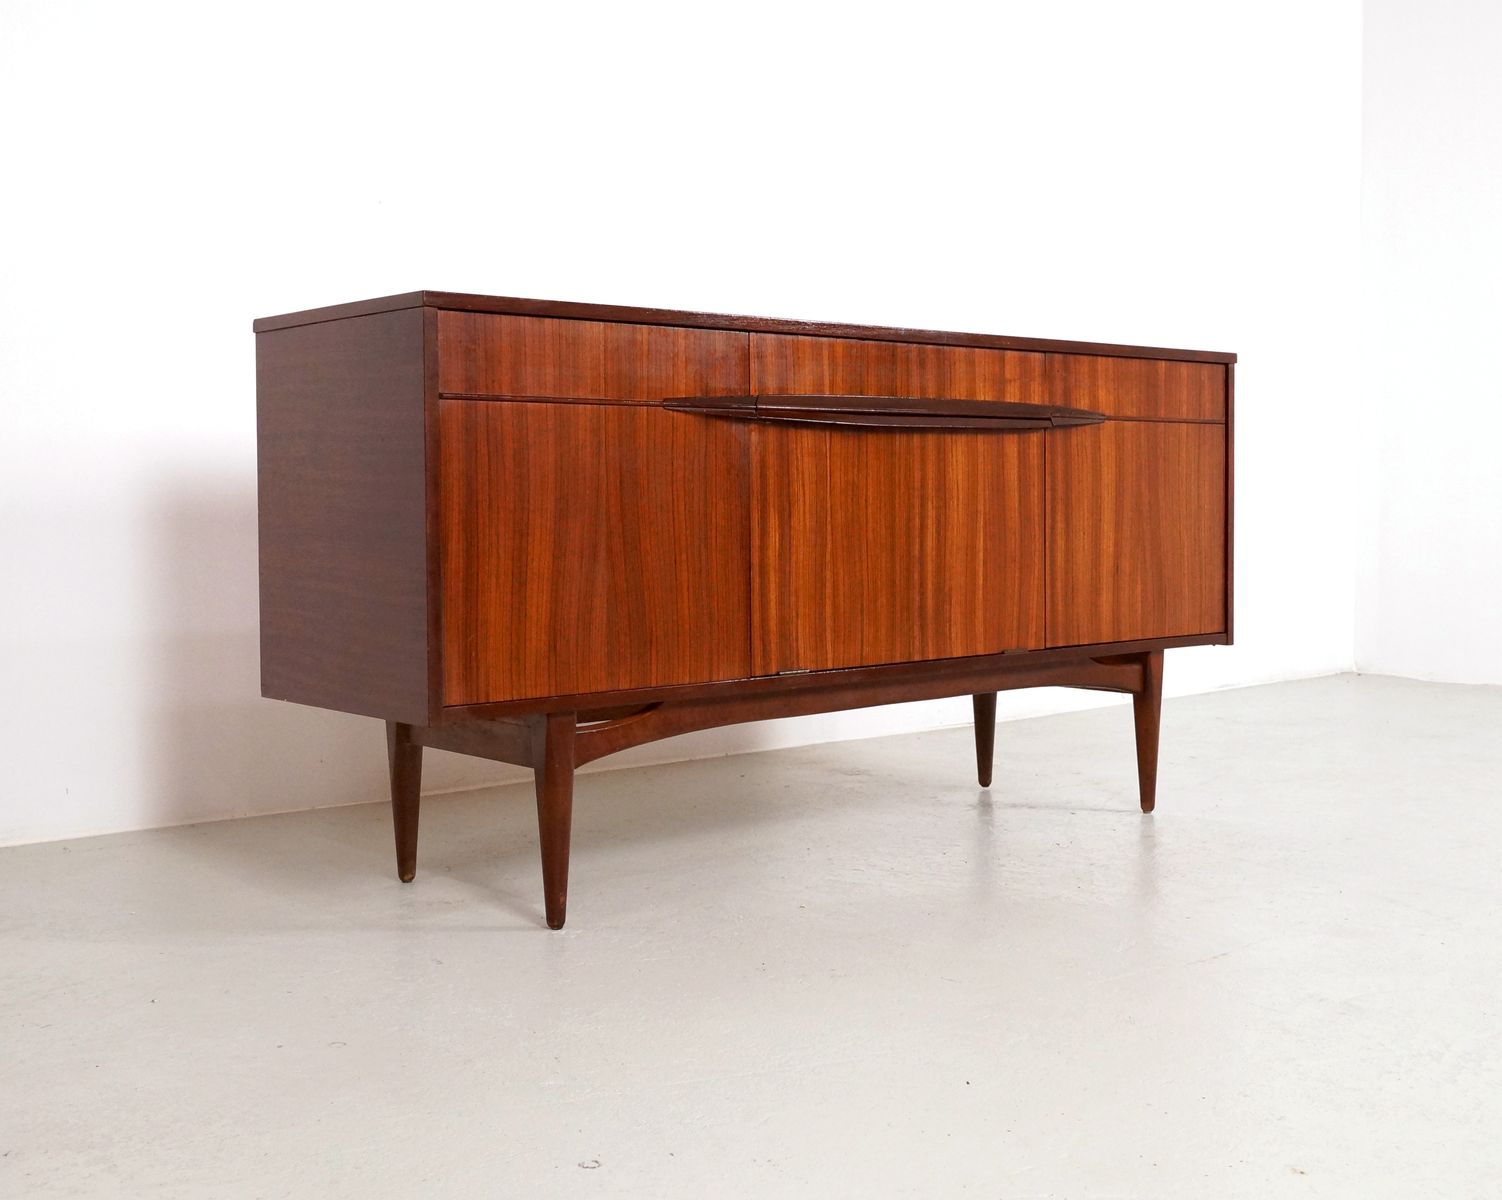 mid century sideboard in dark teak 1960s for sale at pamono. Black Bedroom Furniture Sets. Home Design Ideas